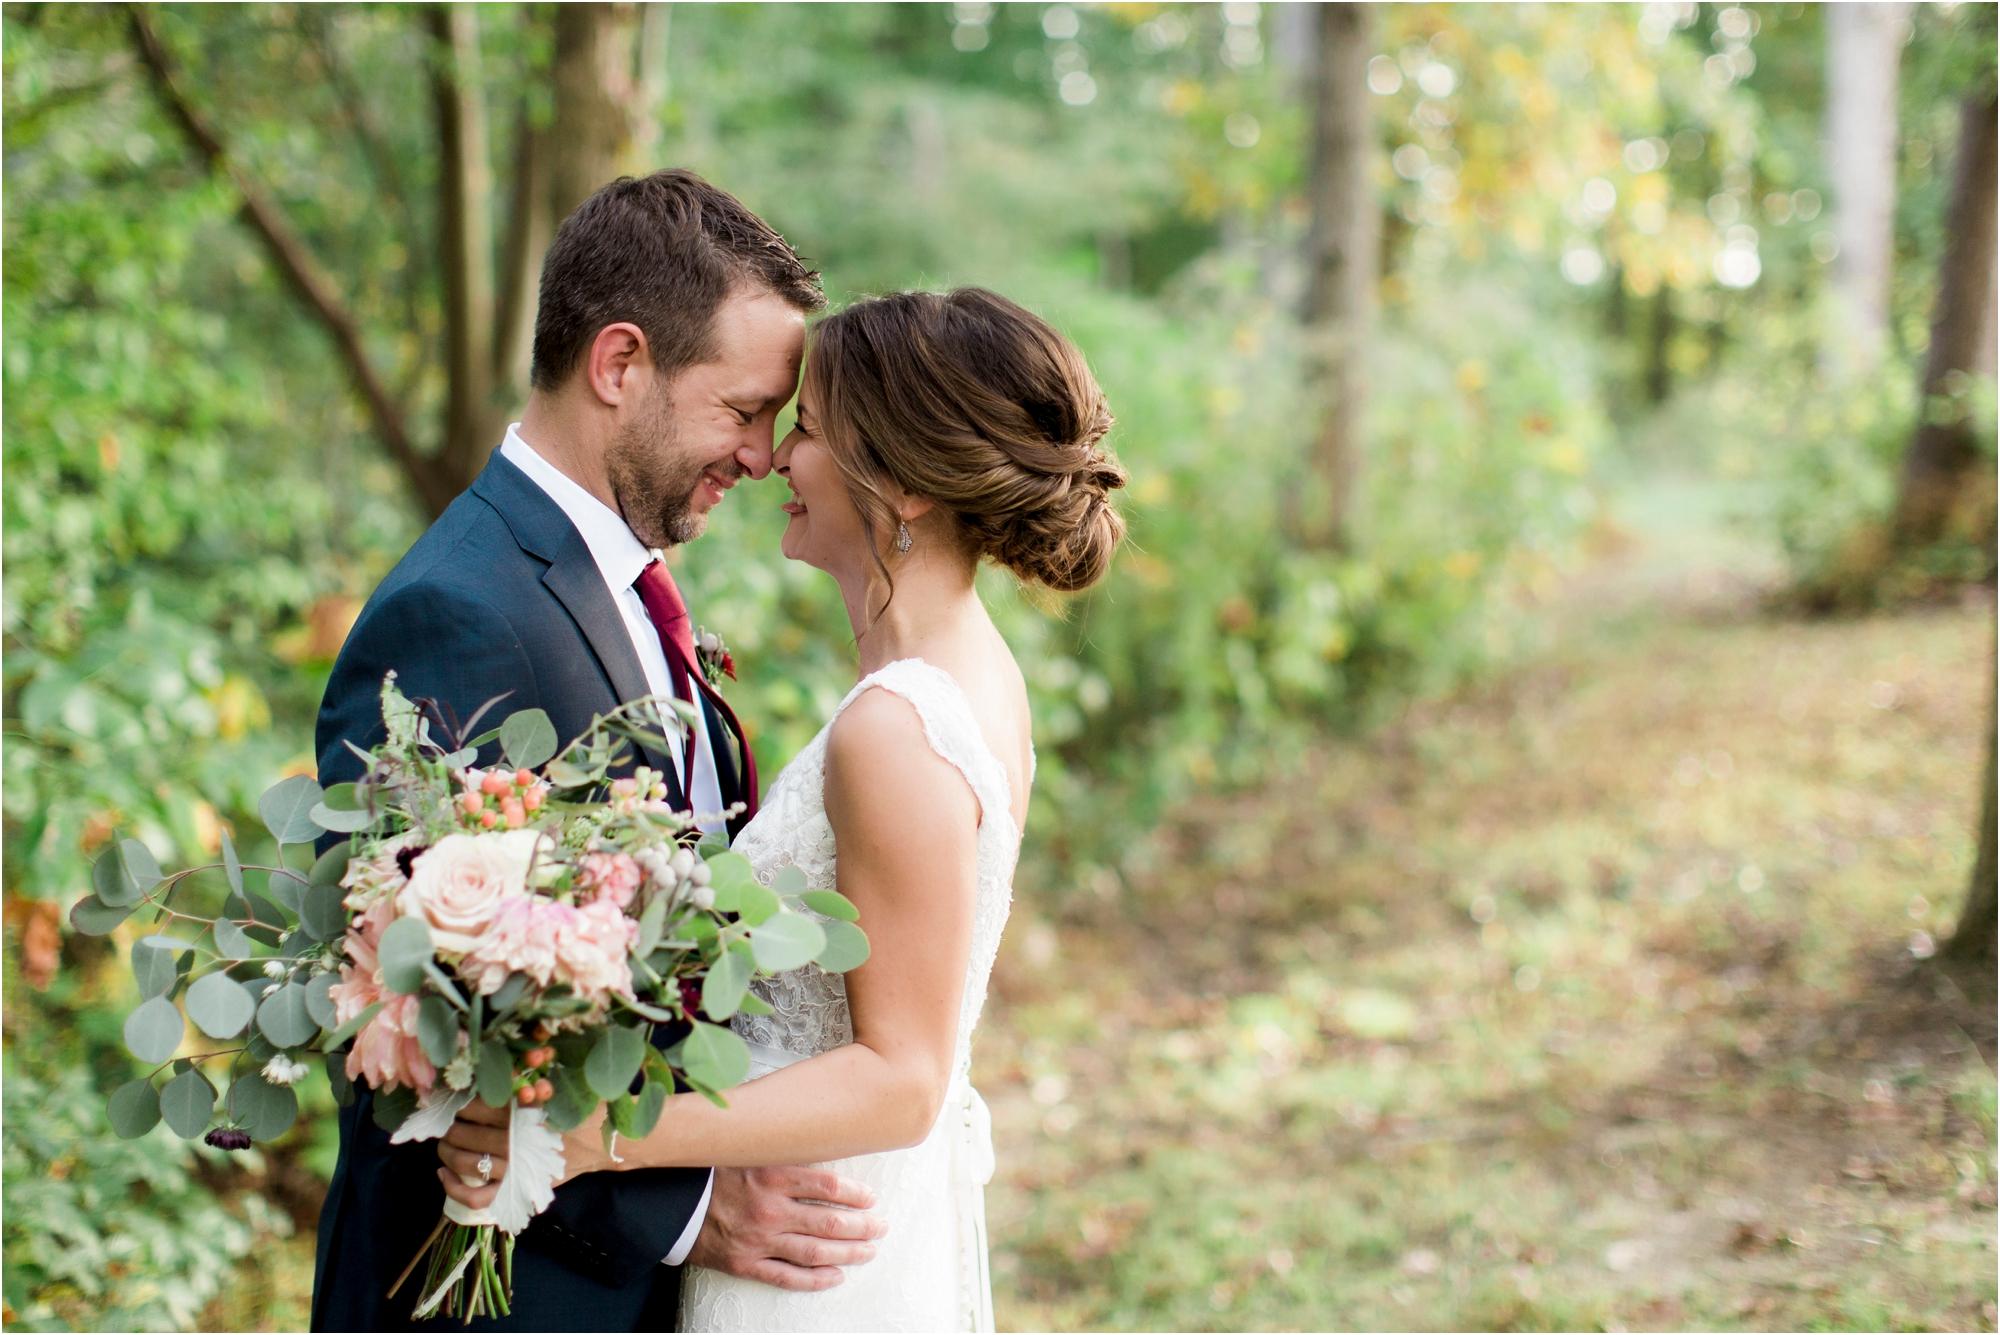 brittany-brad-ashton-creek-vineyard-richmond-virginia-wedding_0036.jpg